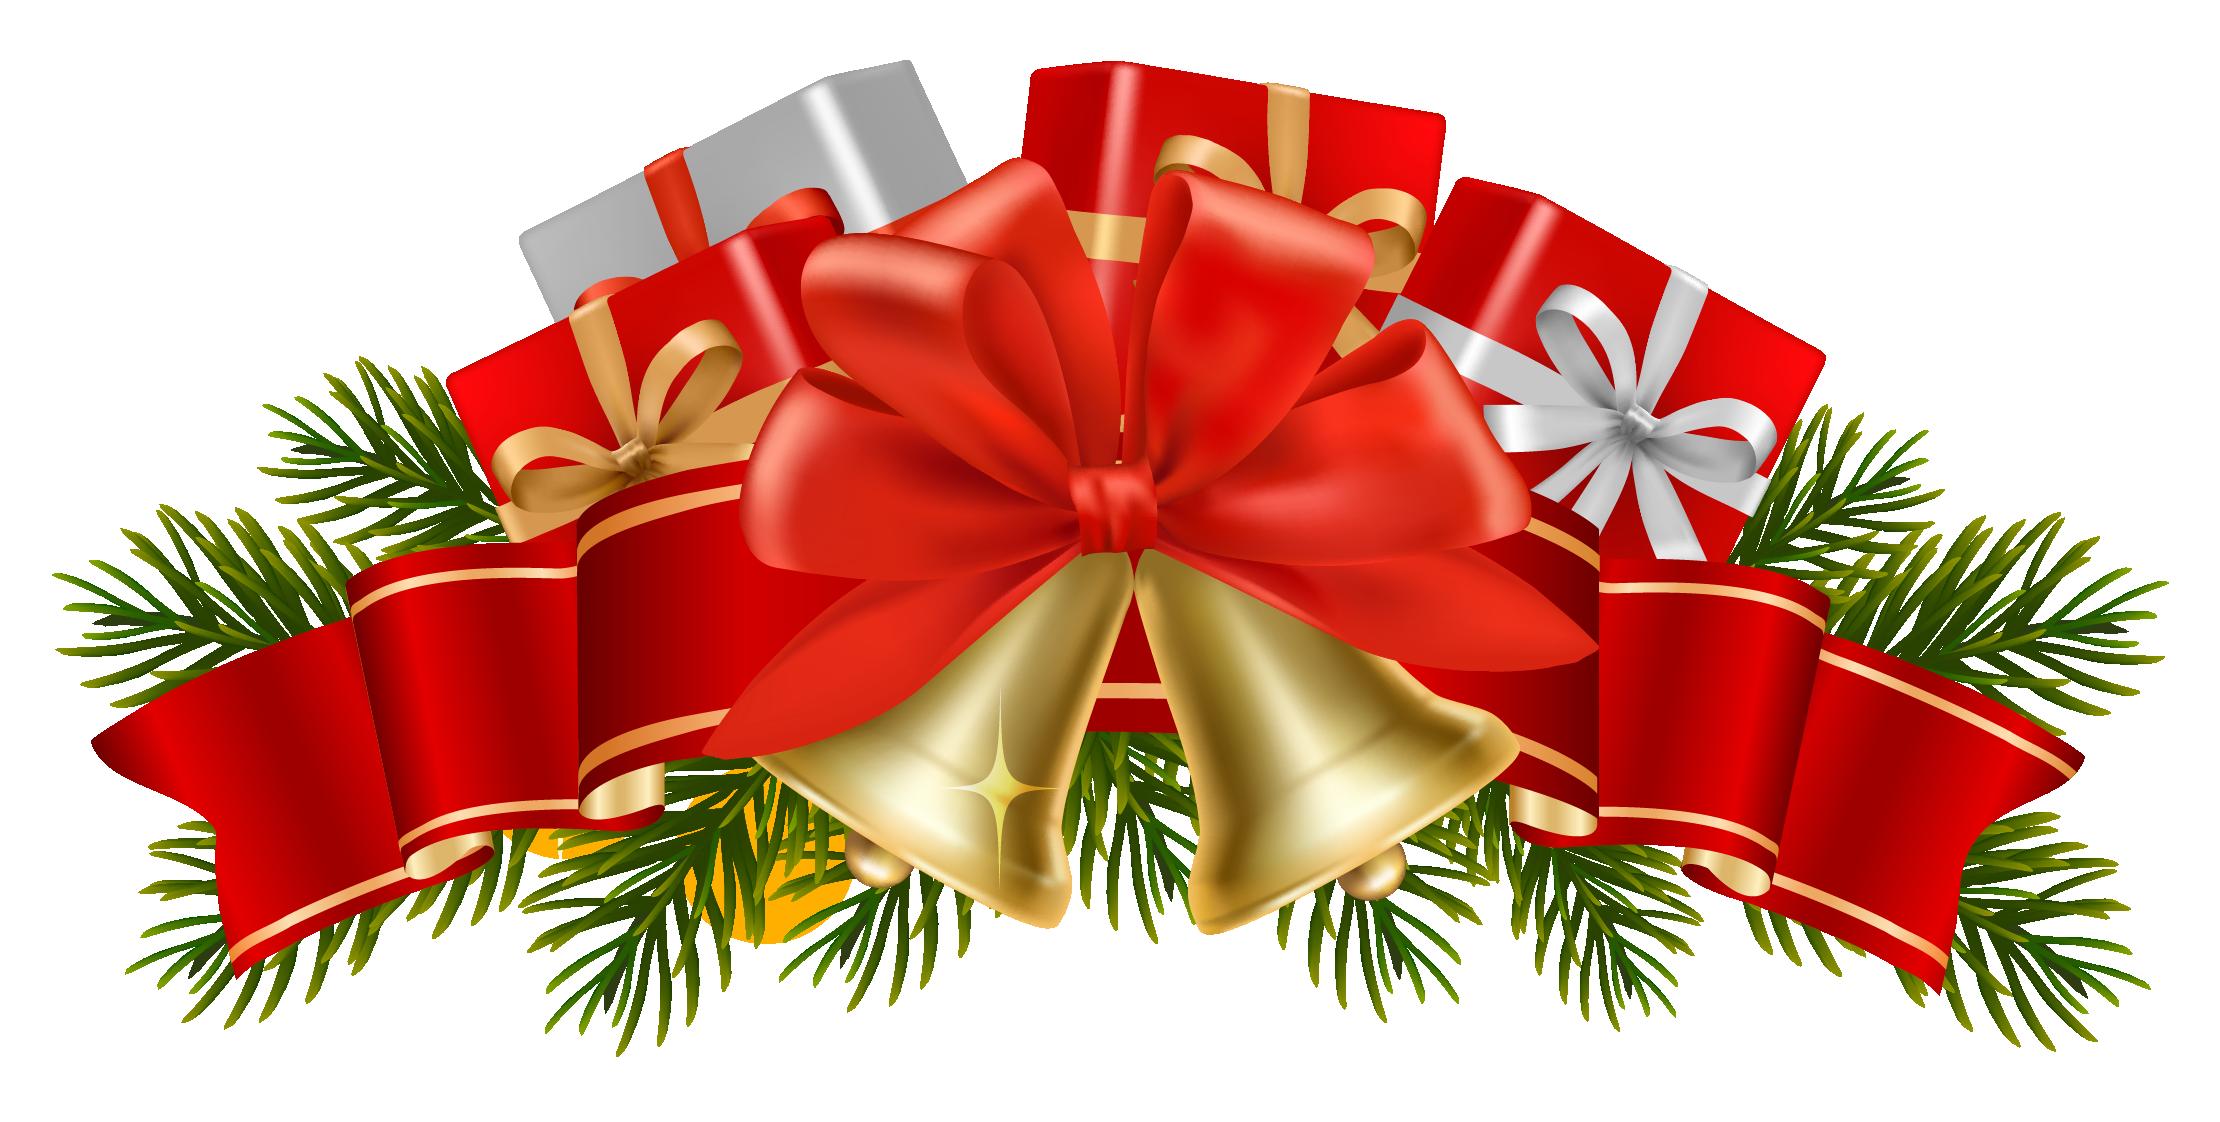 Pin By Sagar Srivastava On Ll Pinterest Christmas